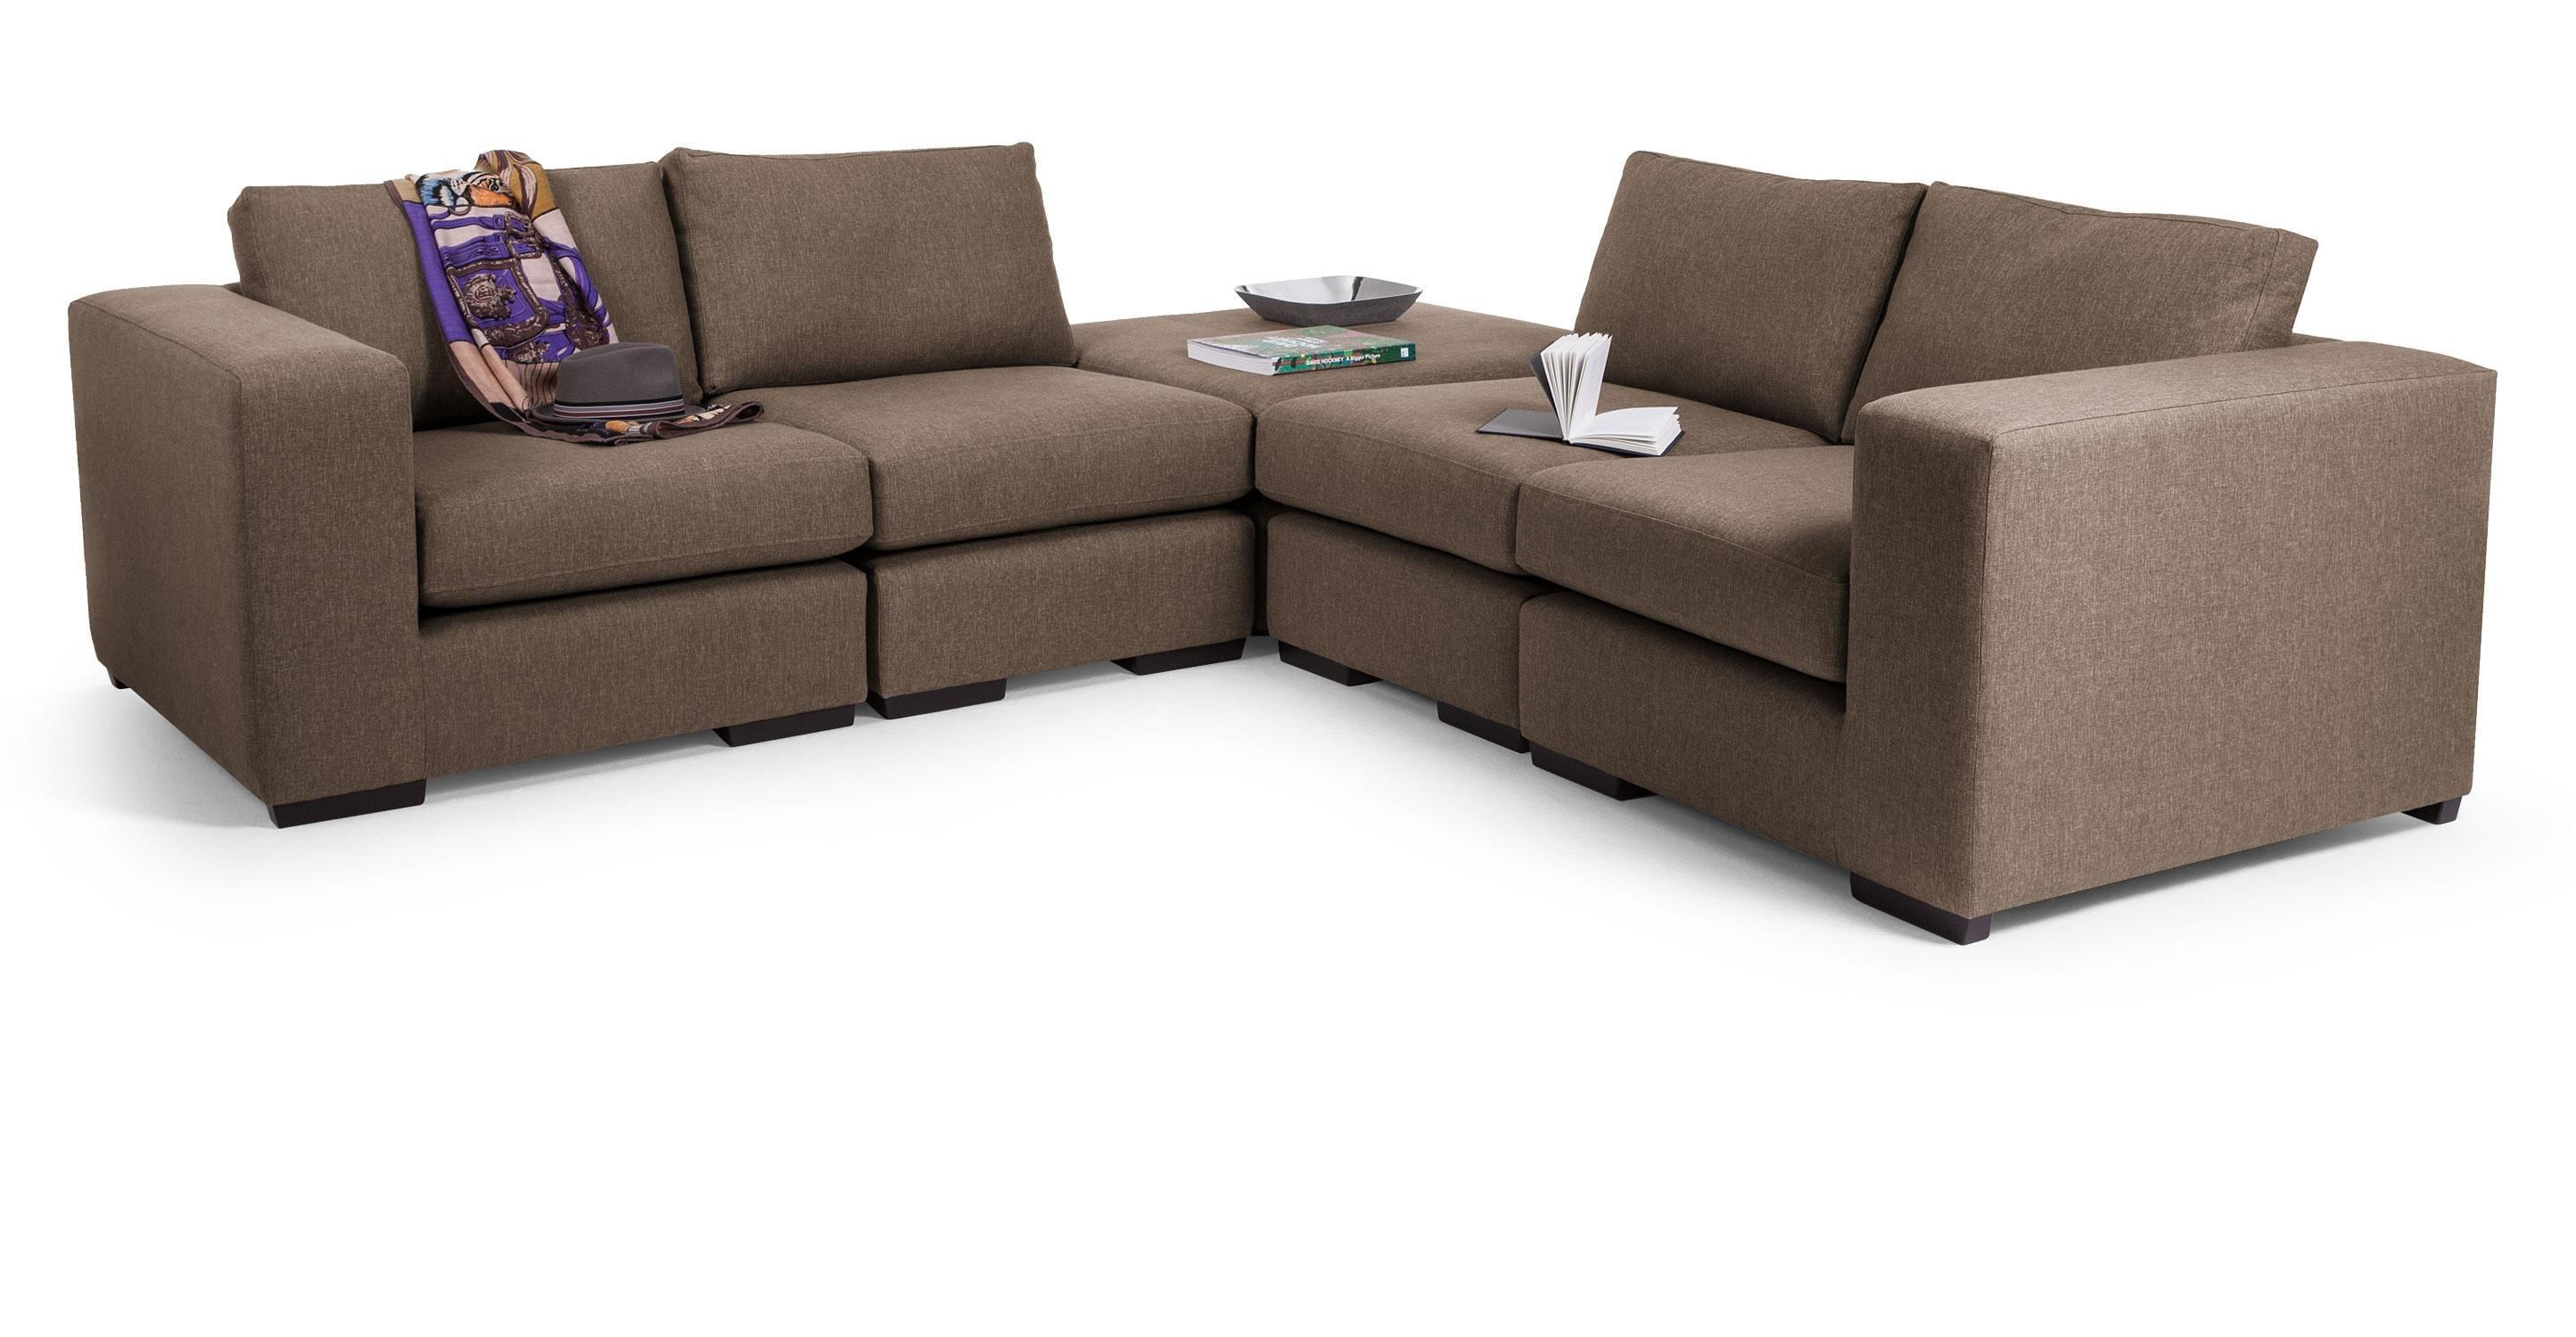 Leather Corner Sofa Set: 20+ Choices Of Black Leather Corner Sofas